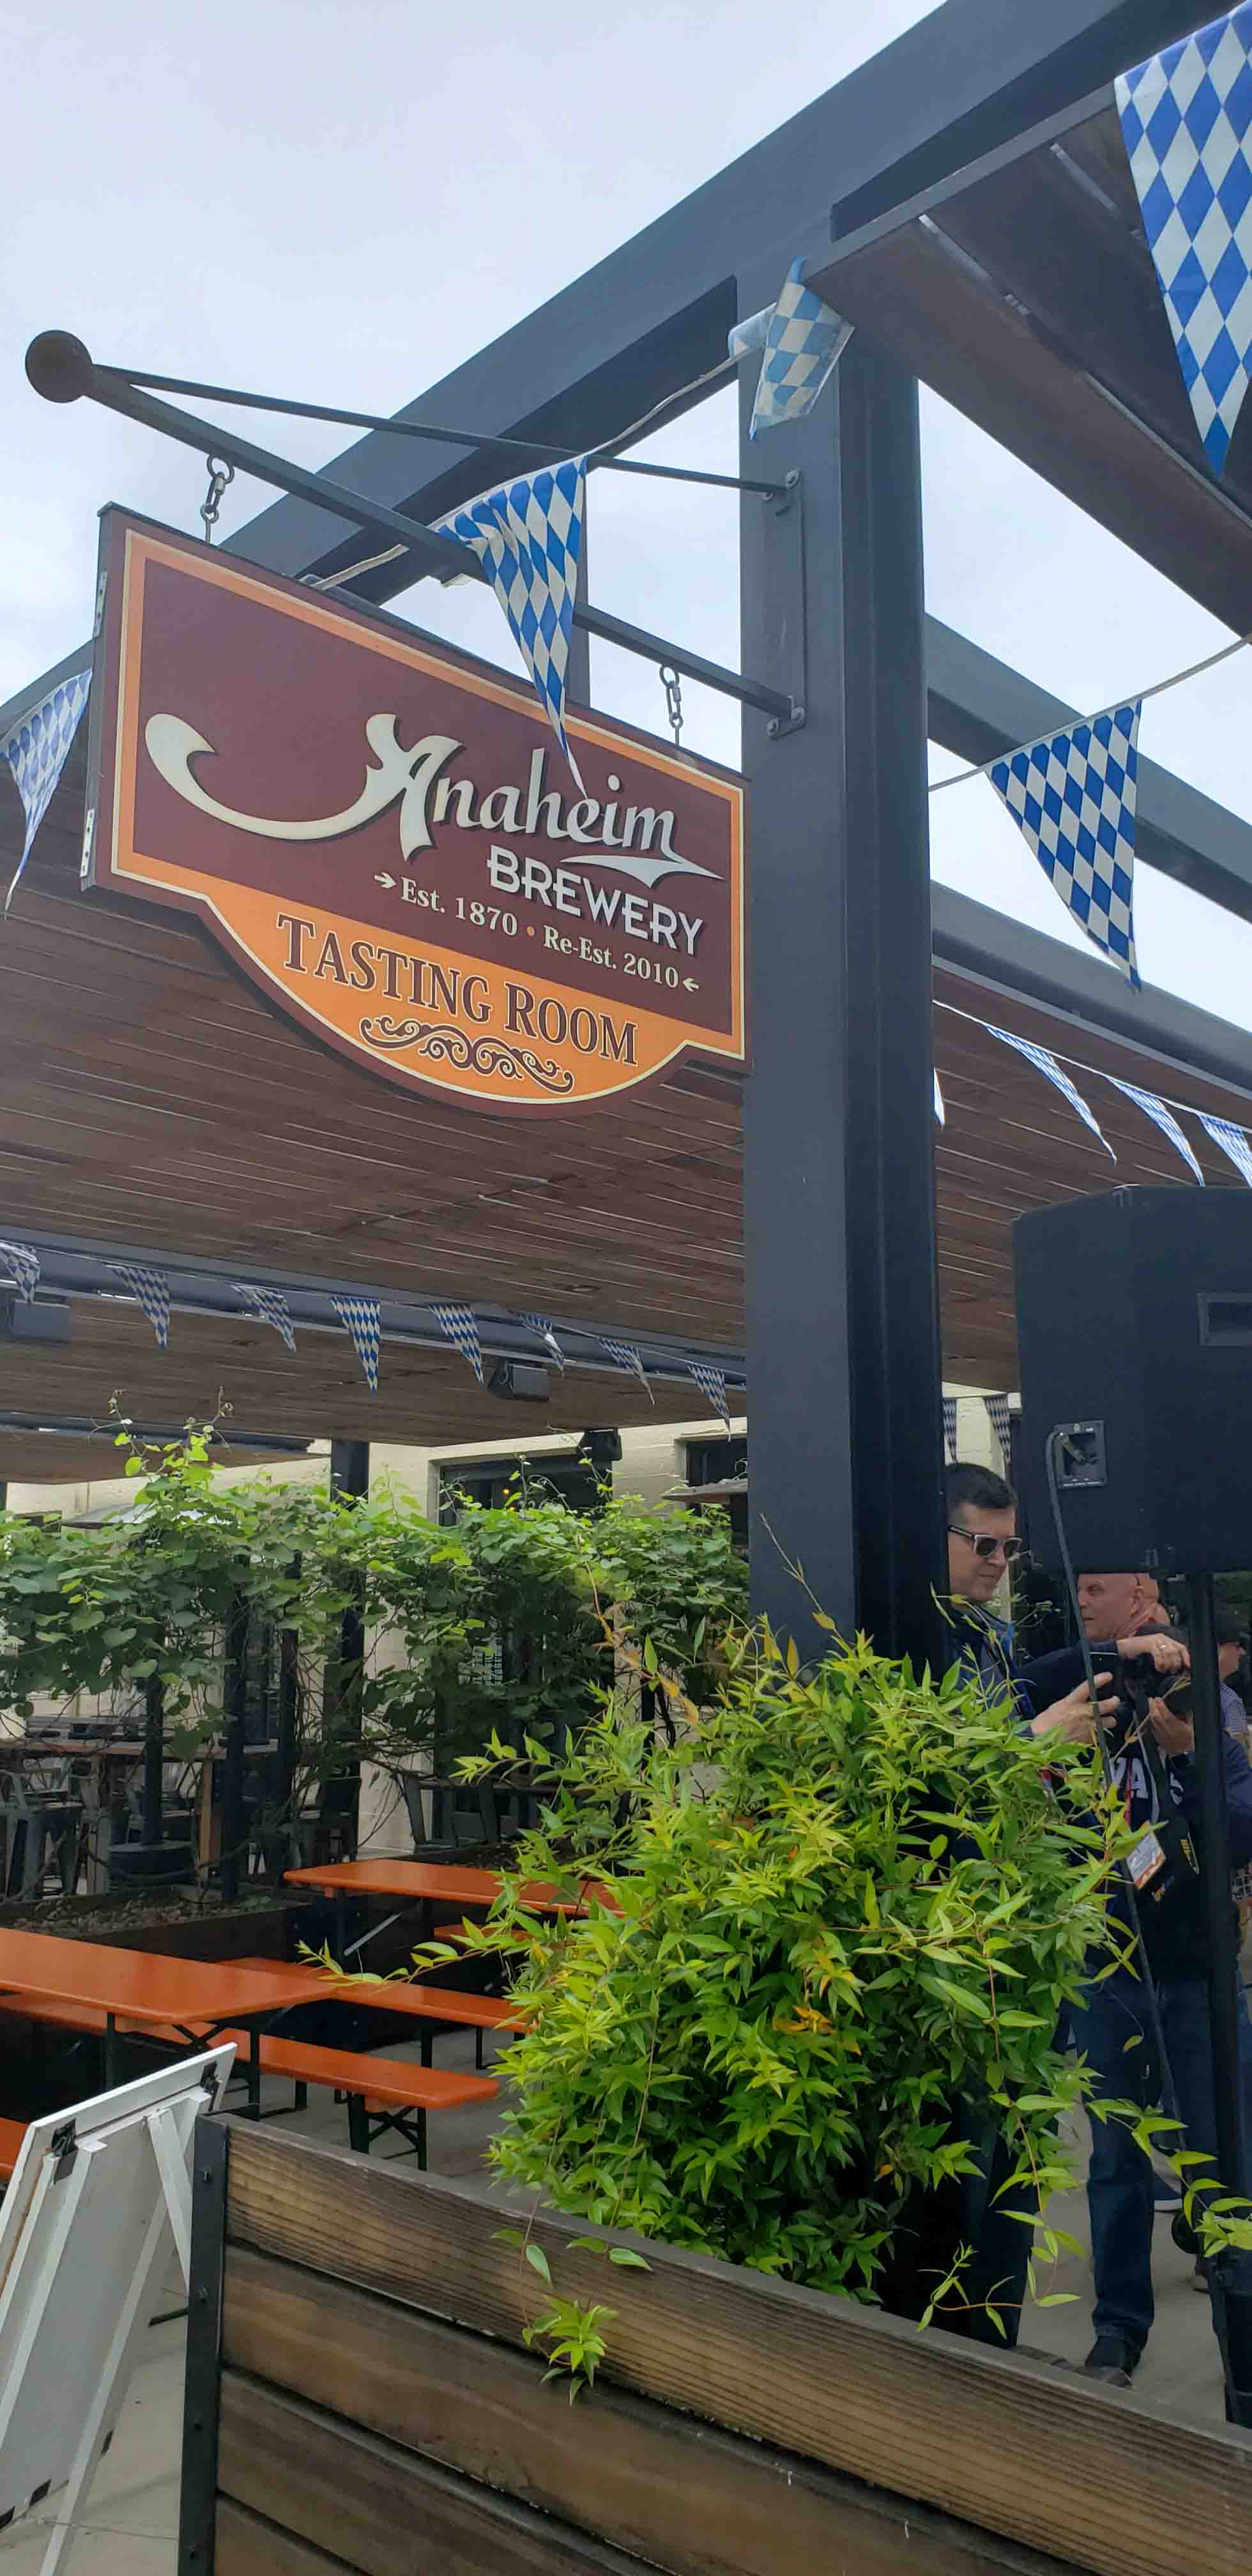 Fachada da Anaheim Brewery